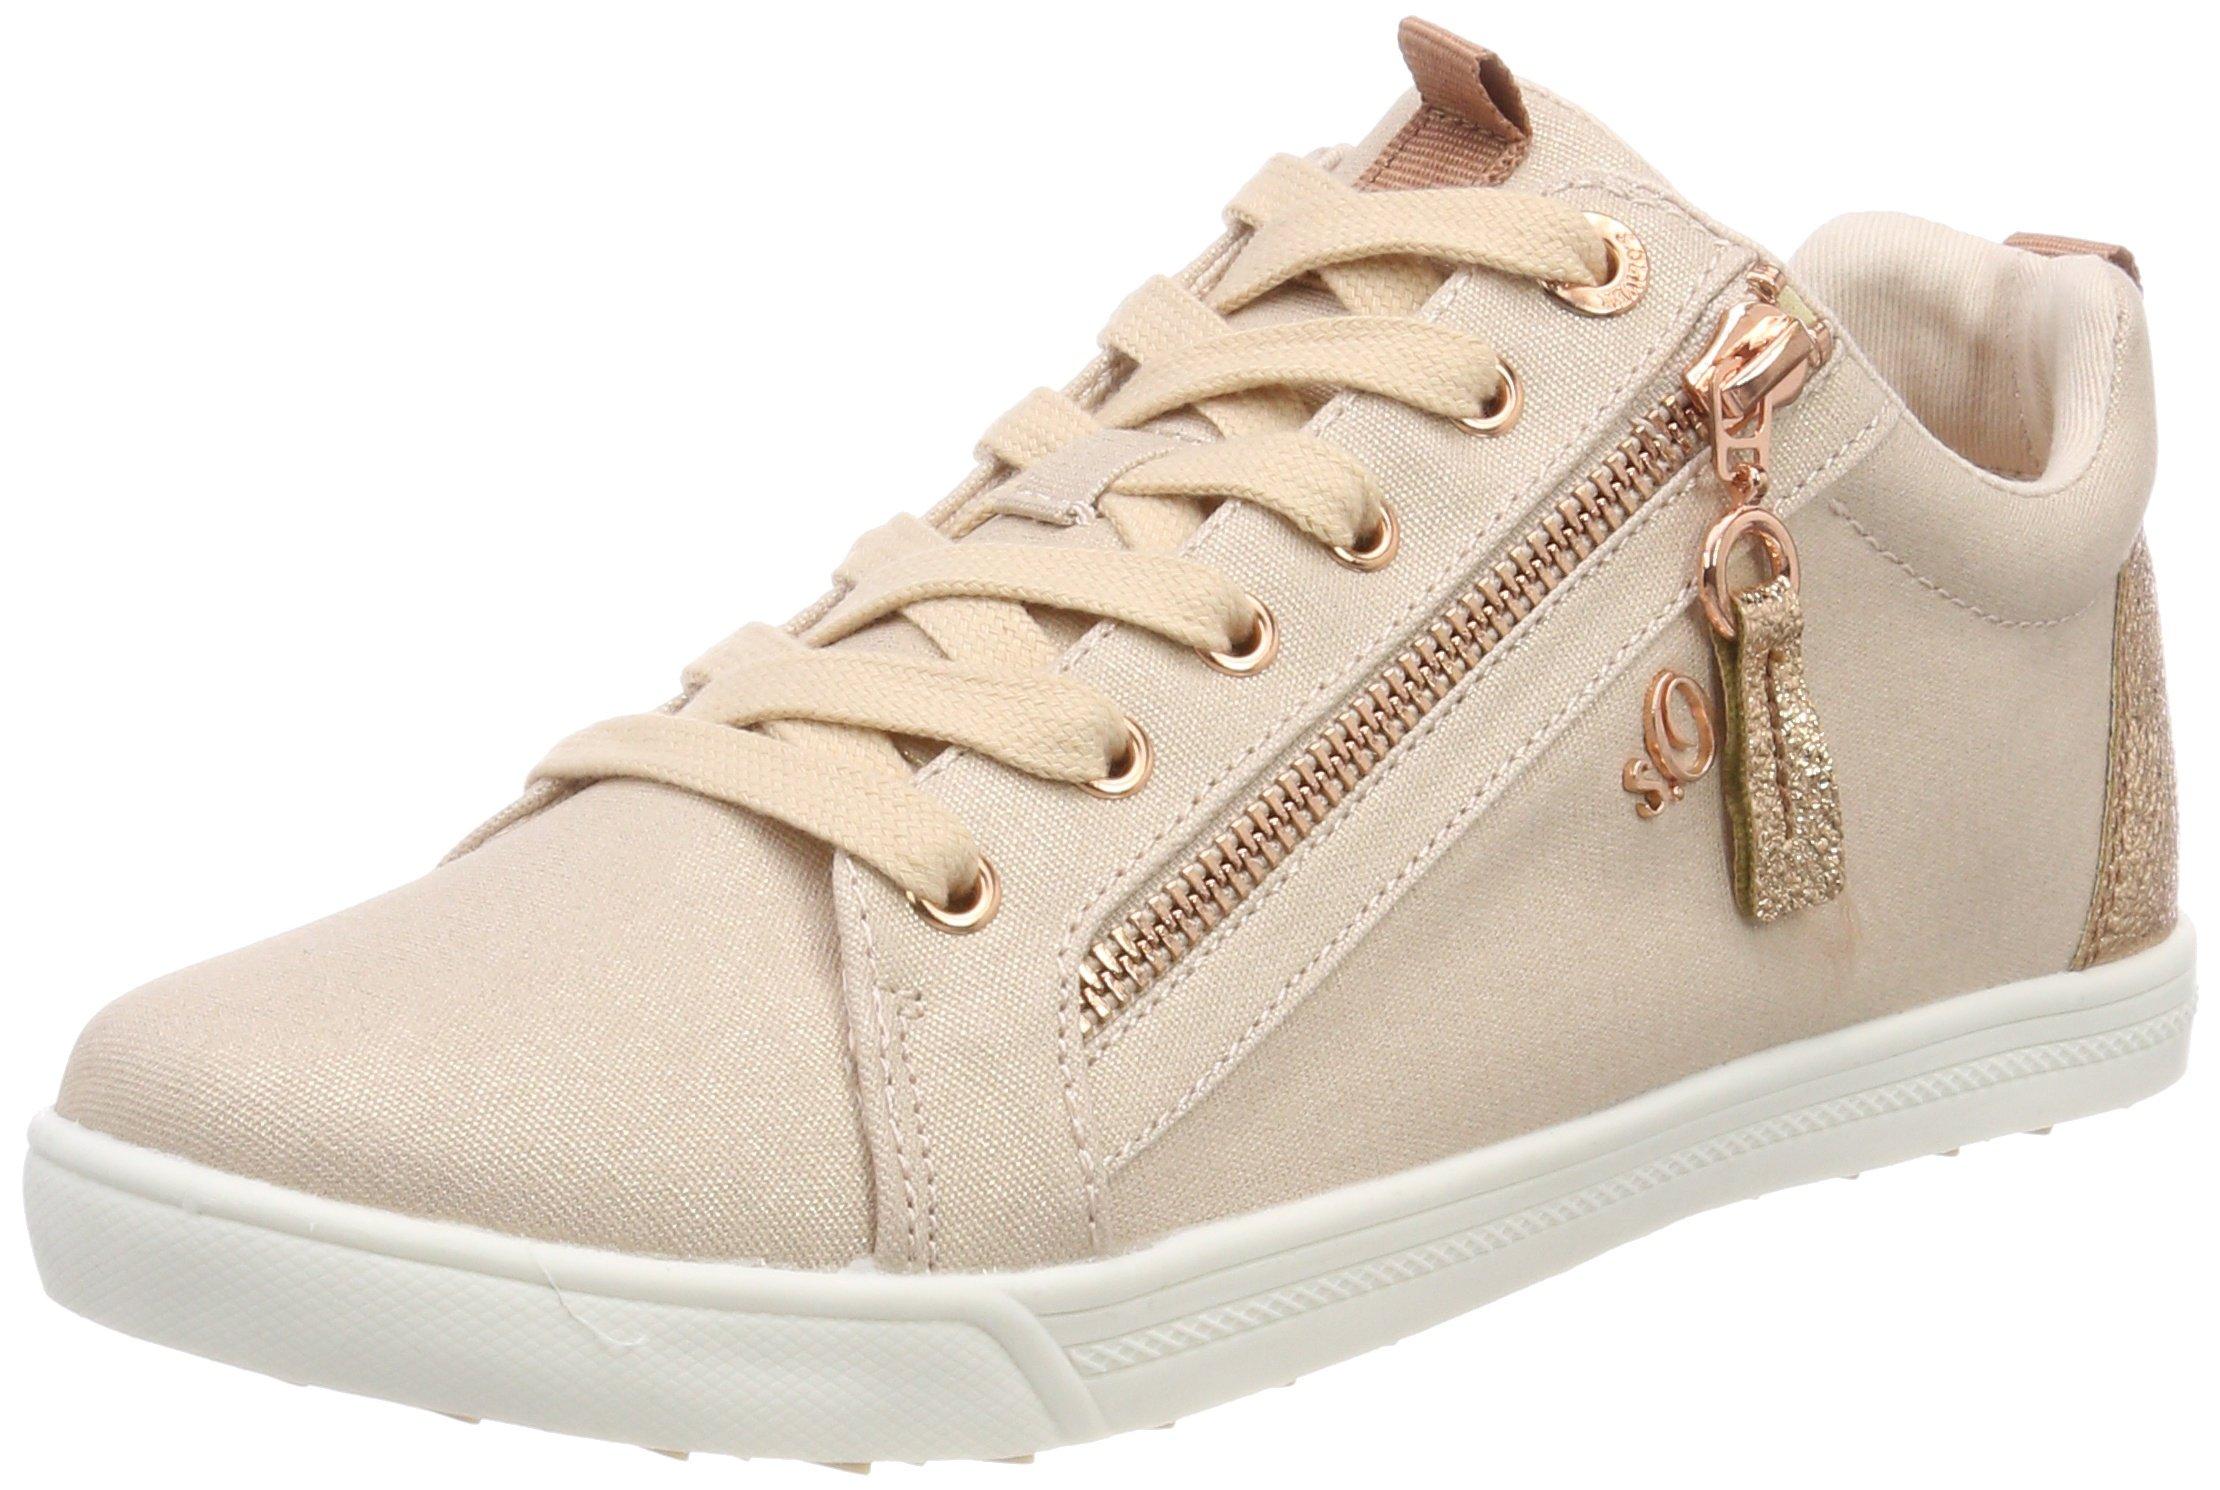 oliver Femmerose Metallic39 Eu S Basses 25201Sneakers lKFT1Jc3